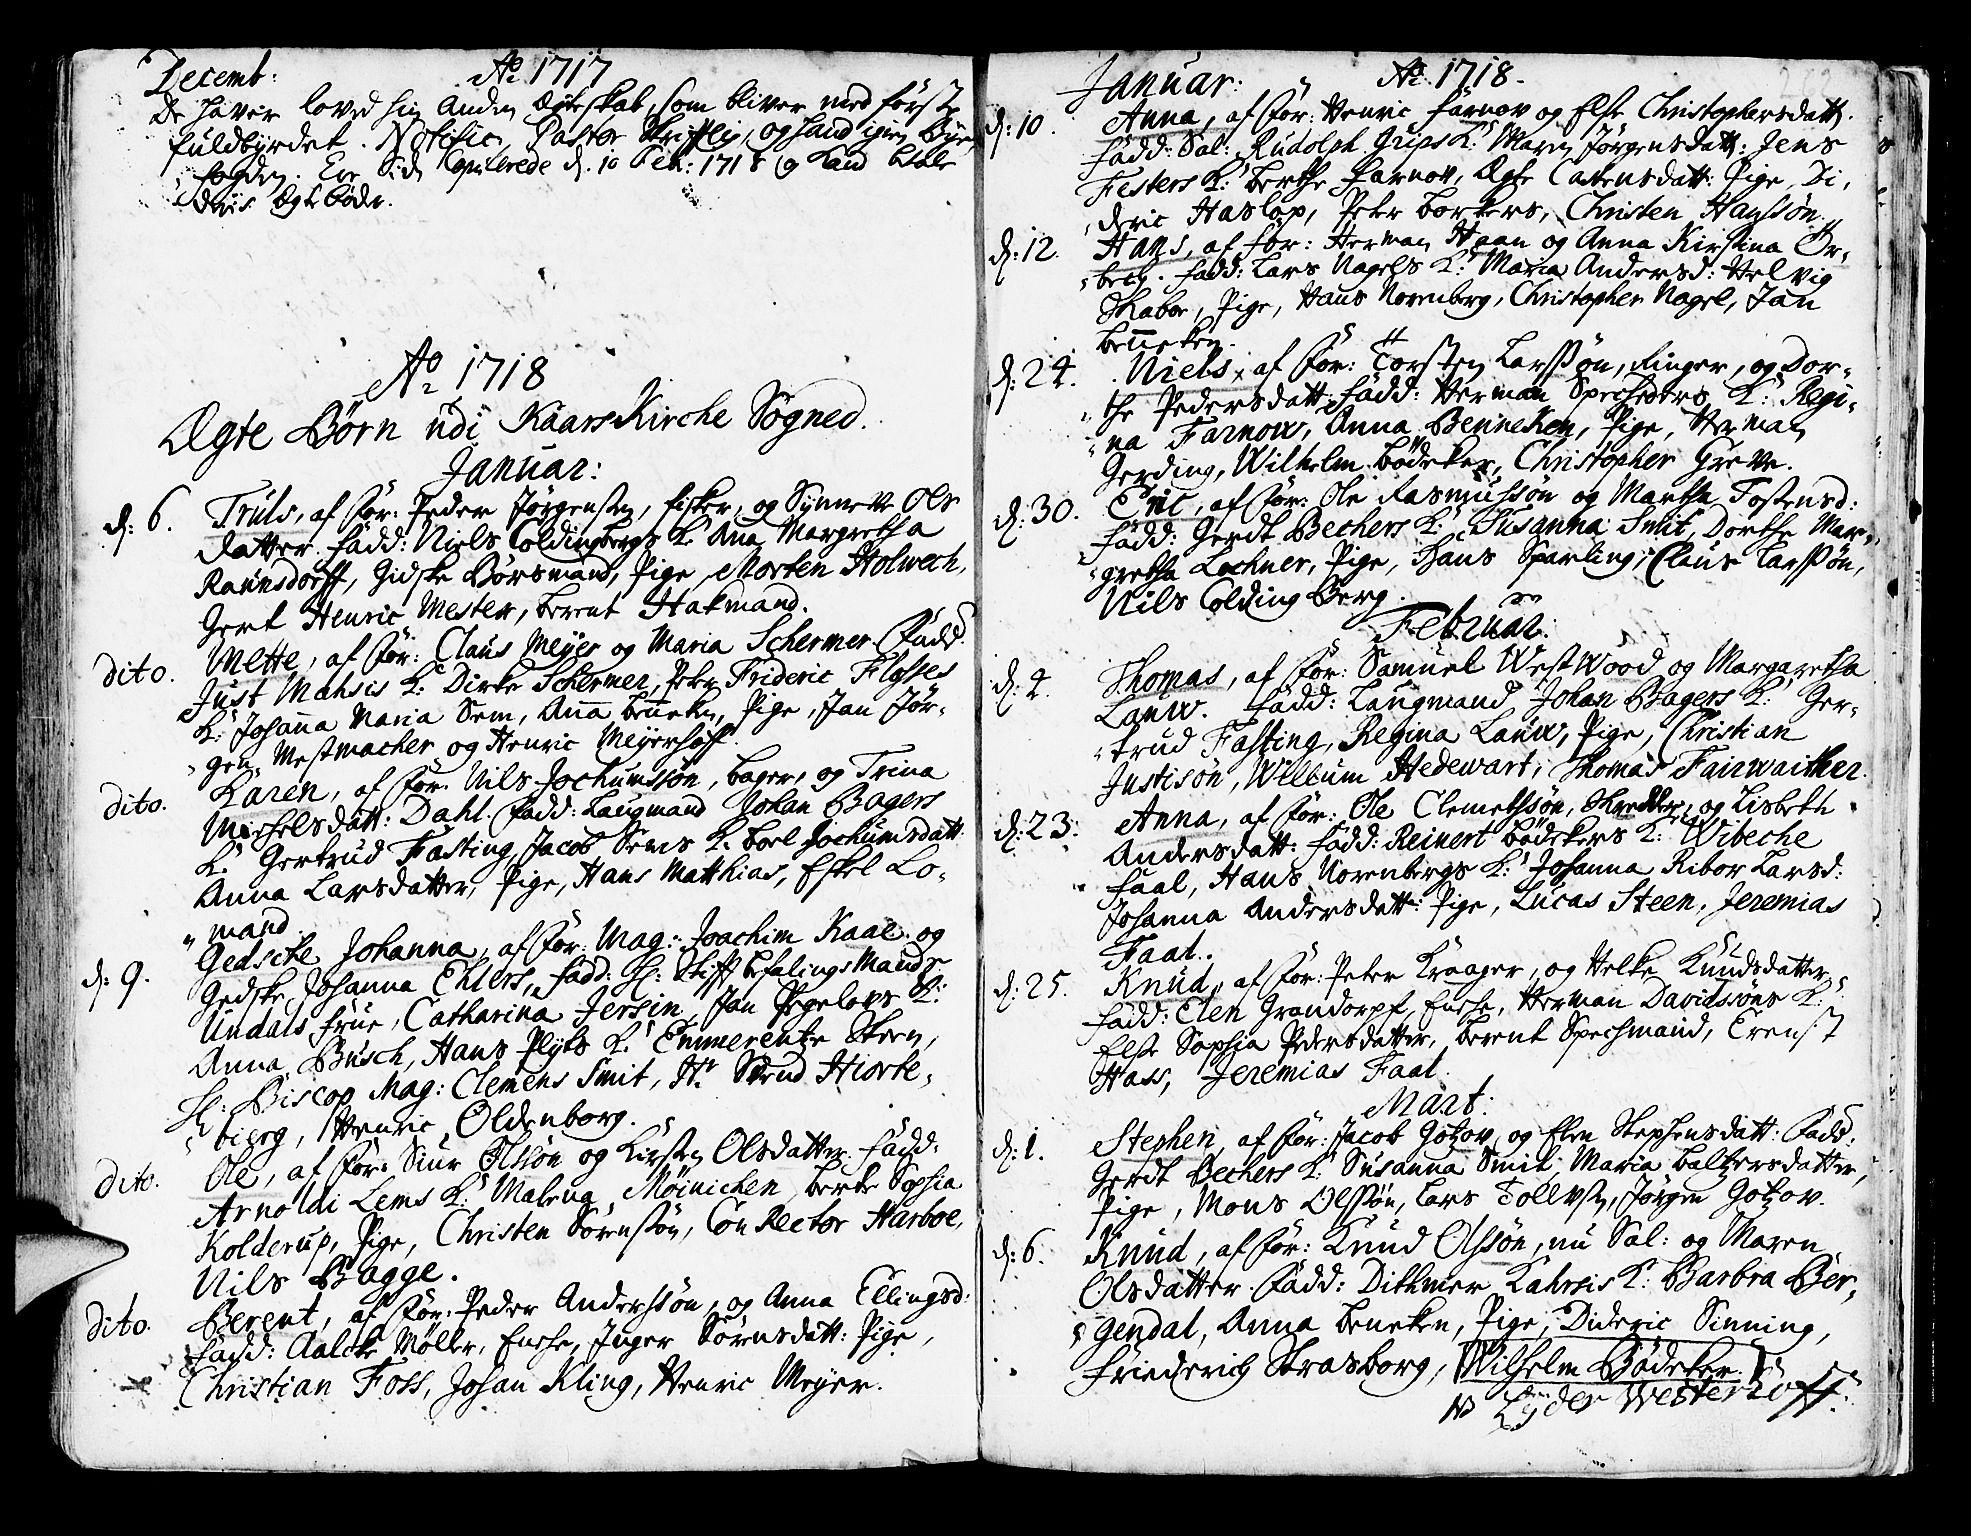 SAB, Korskirken Sokneprestembete, H/Haa/L0003: Ministerialbok nr. A 3, 1698-1719, s. 262